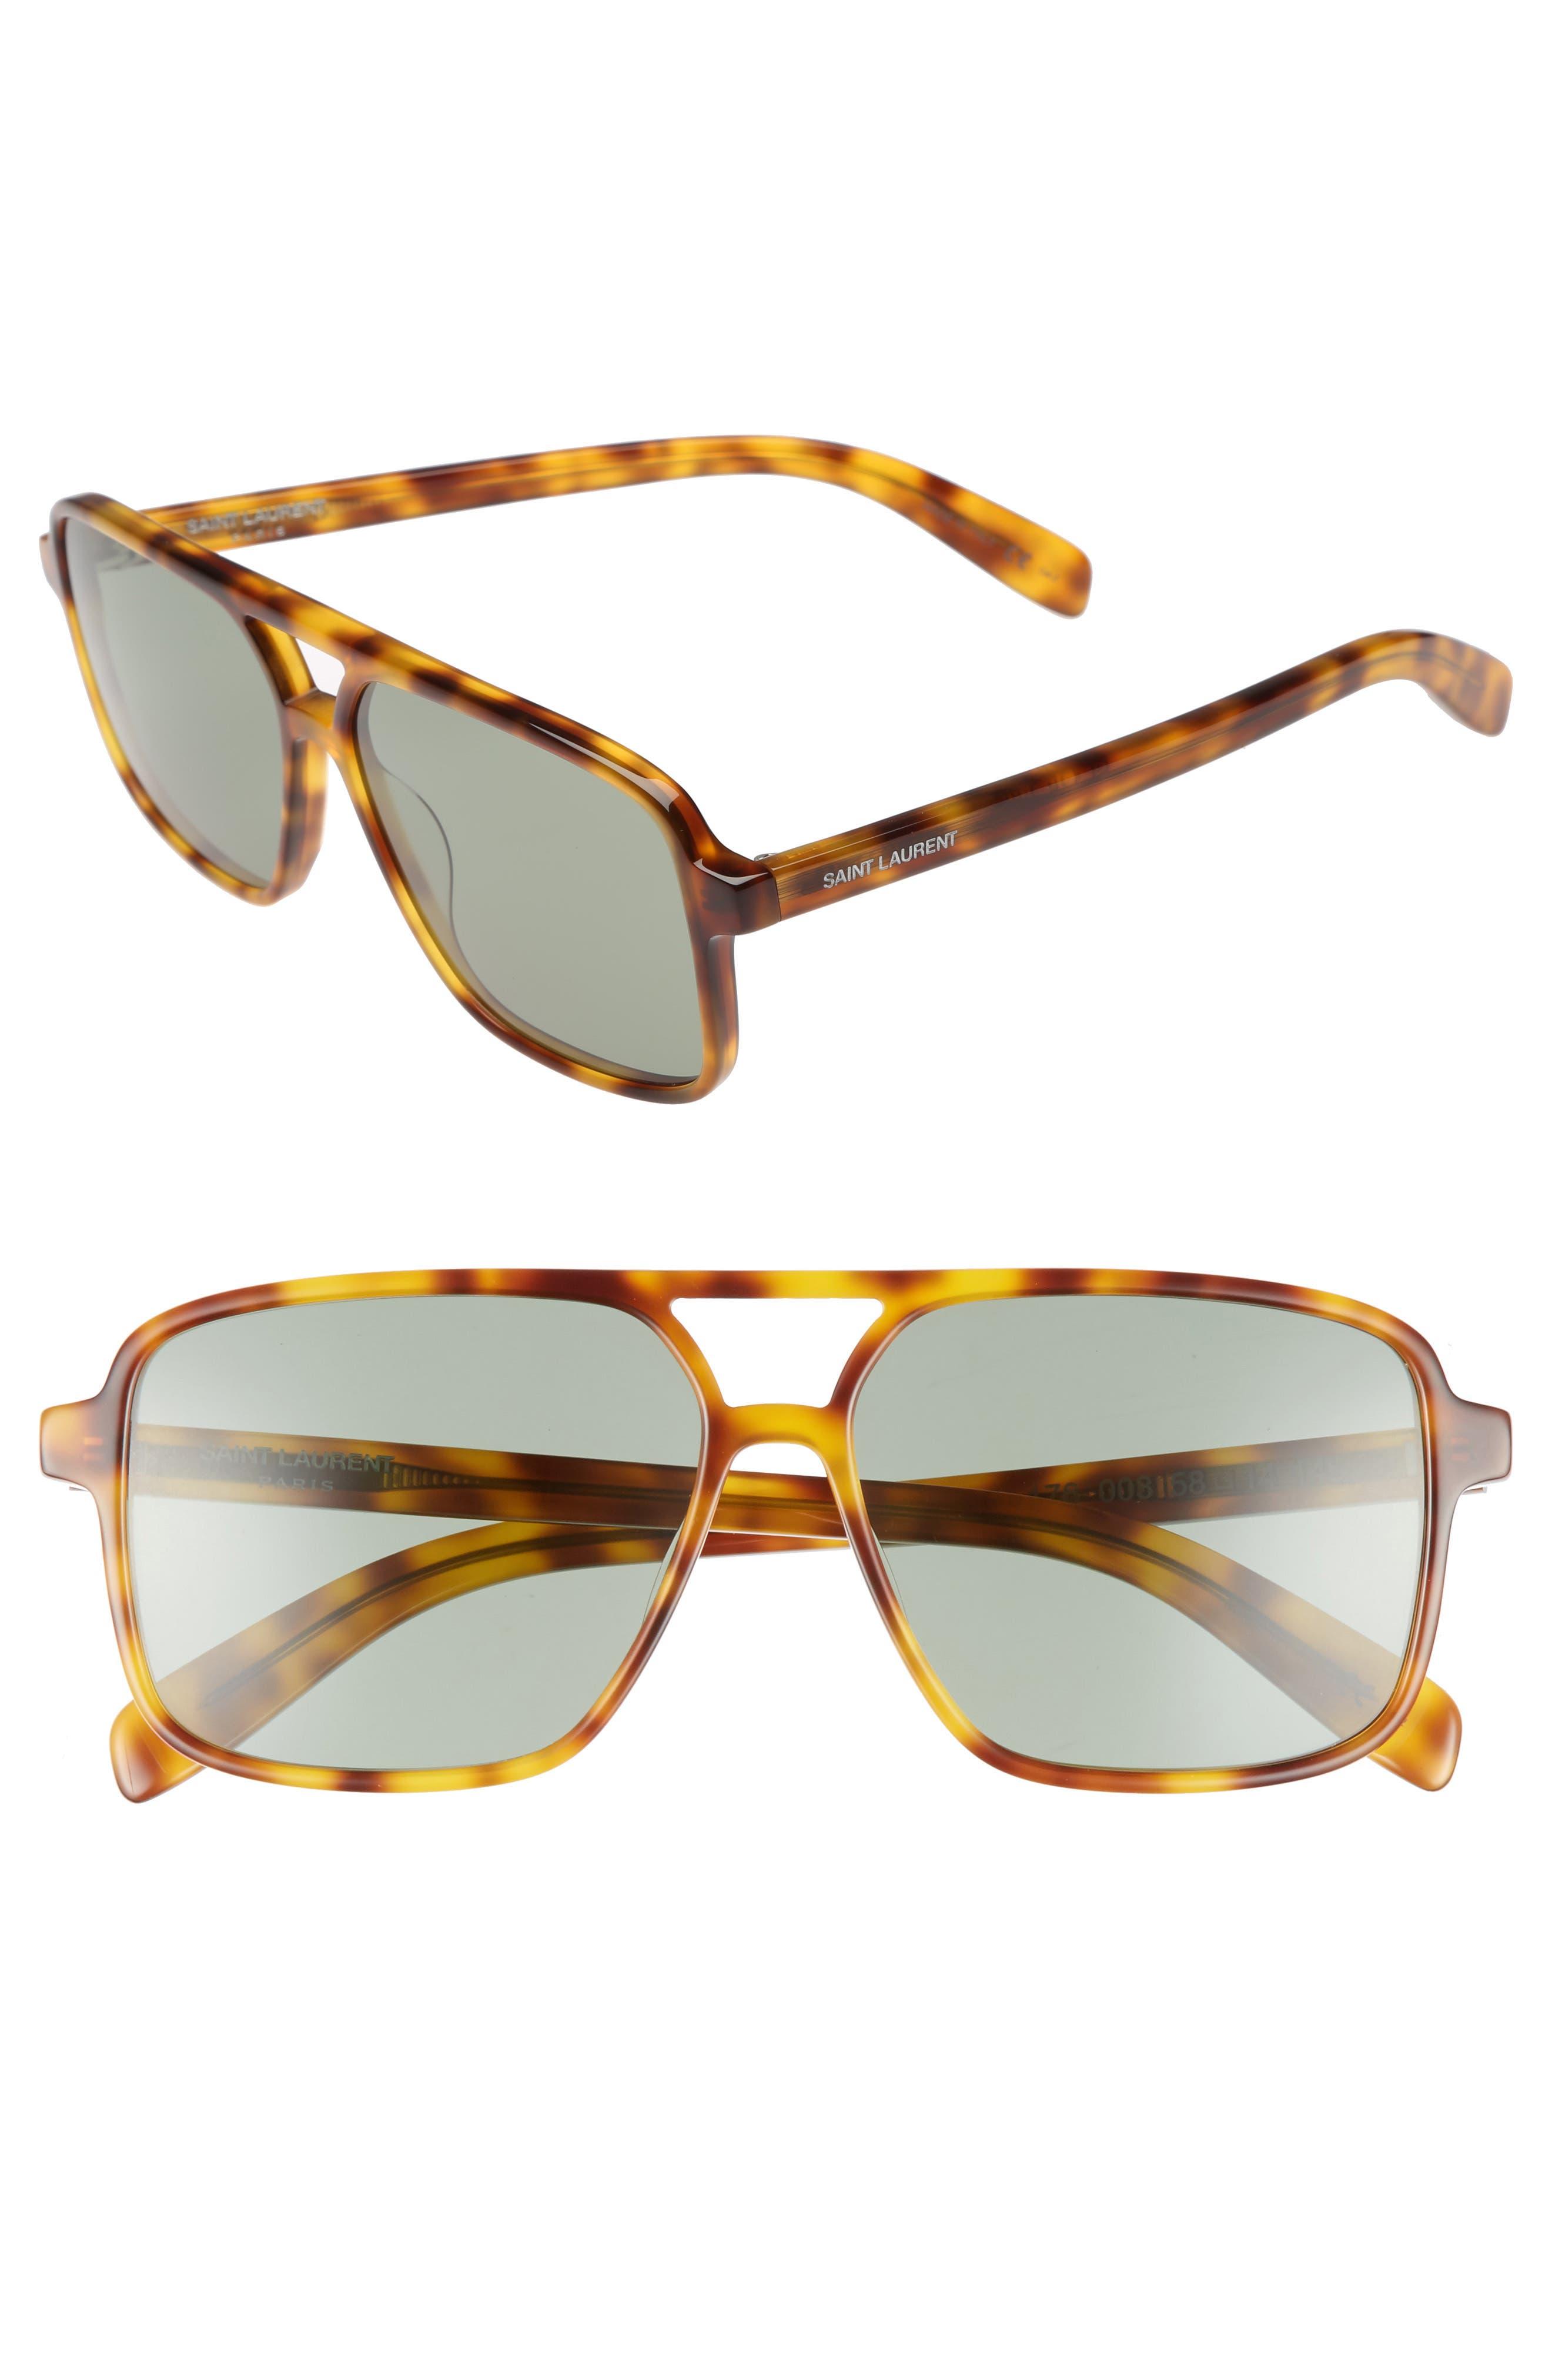 58mm Square Navigator Sunglasses,                             Main thumbnail 1, color,                             HAVANA/ HAVANA/ GREEN